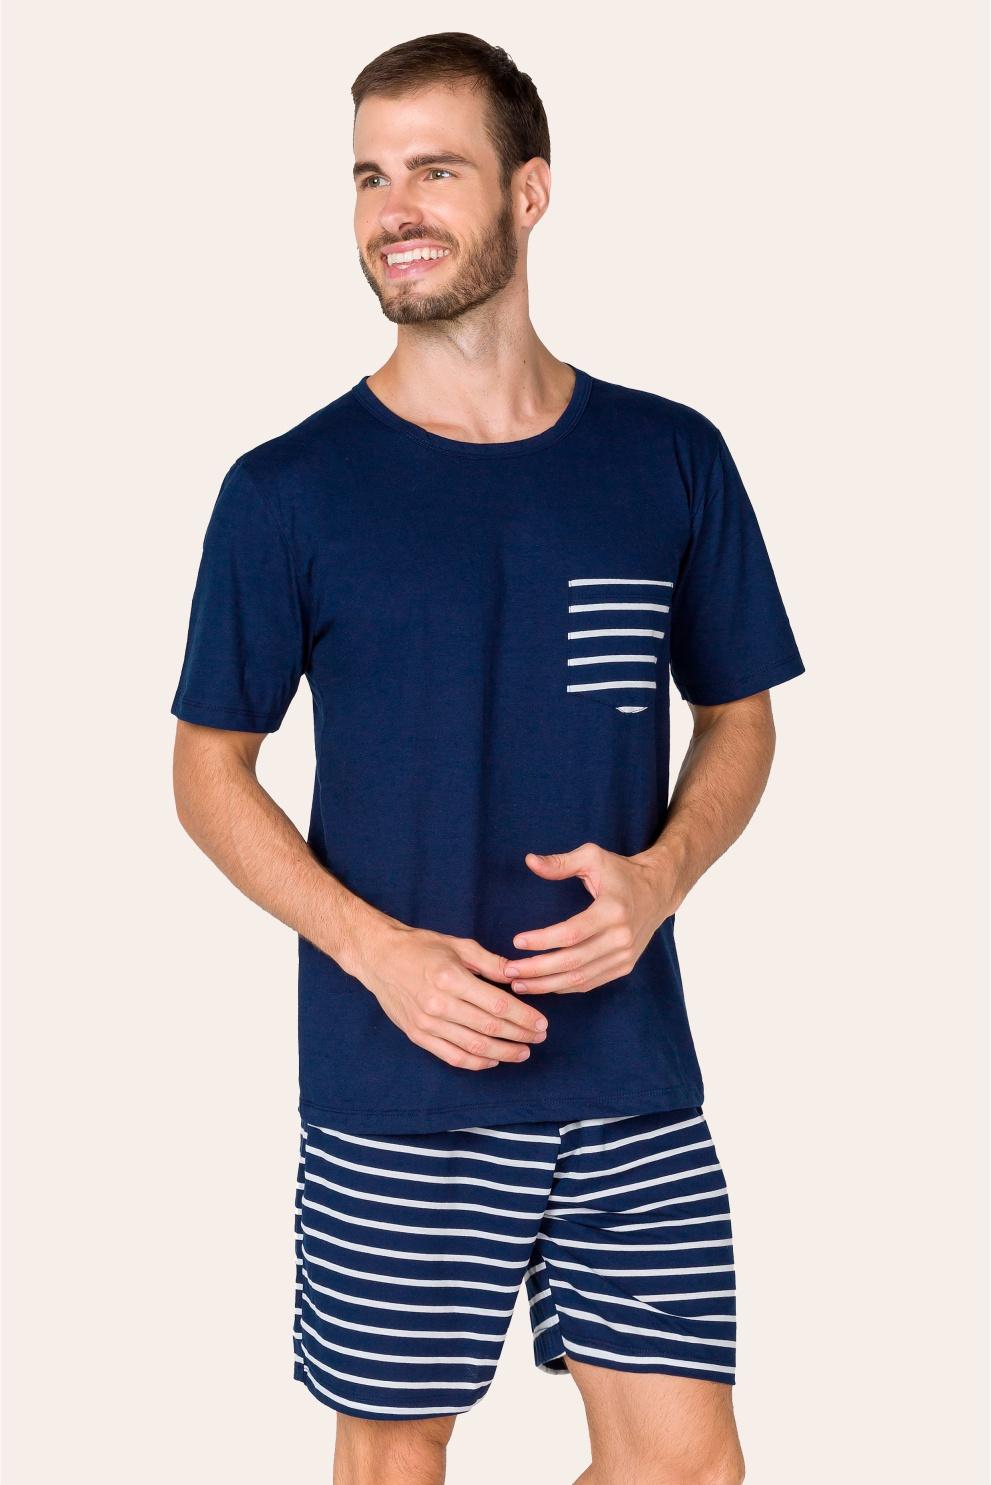 013/C - Pijama Adulto Masculino Listrado com Bolso